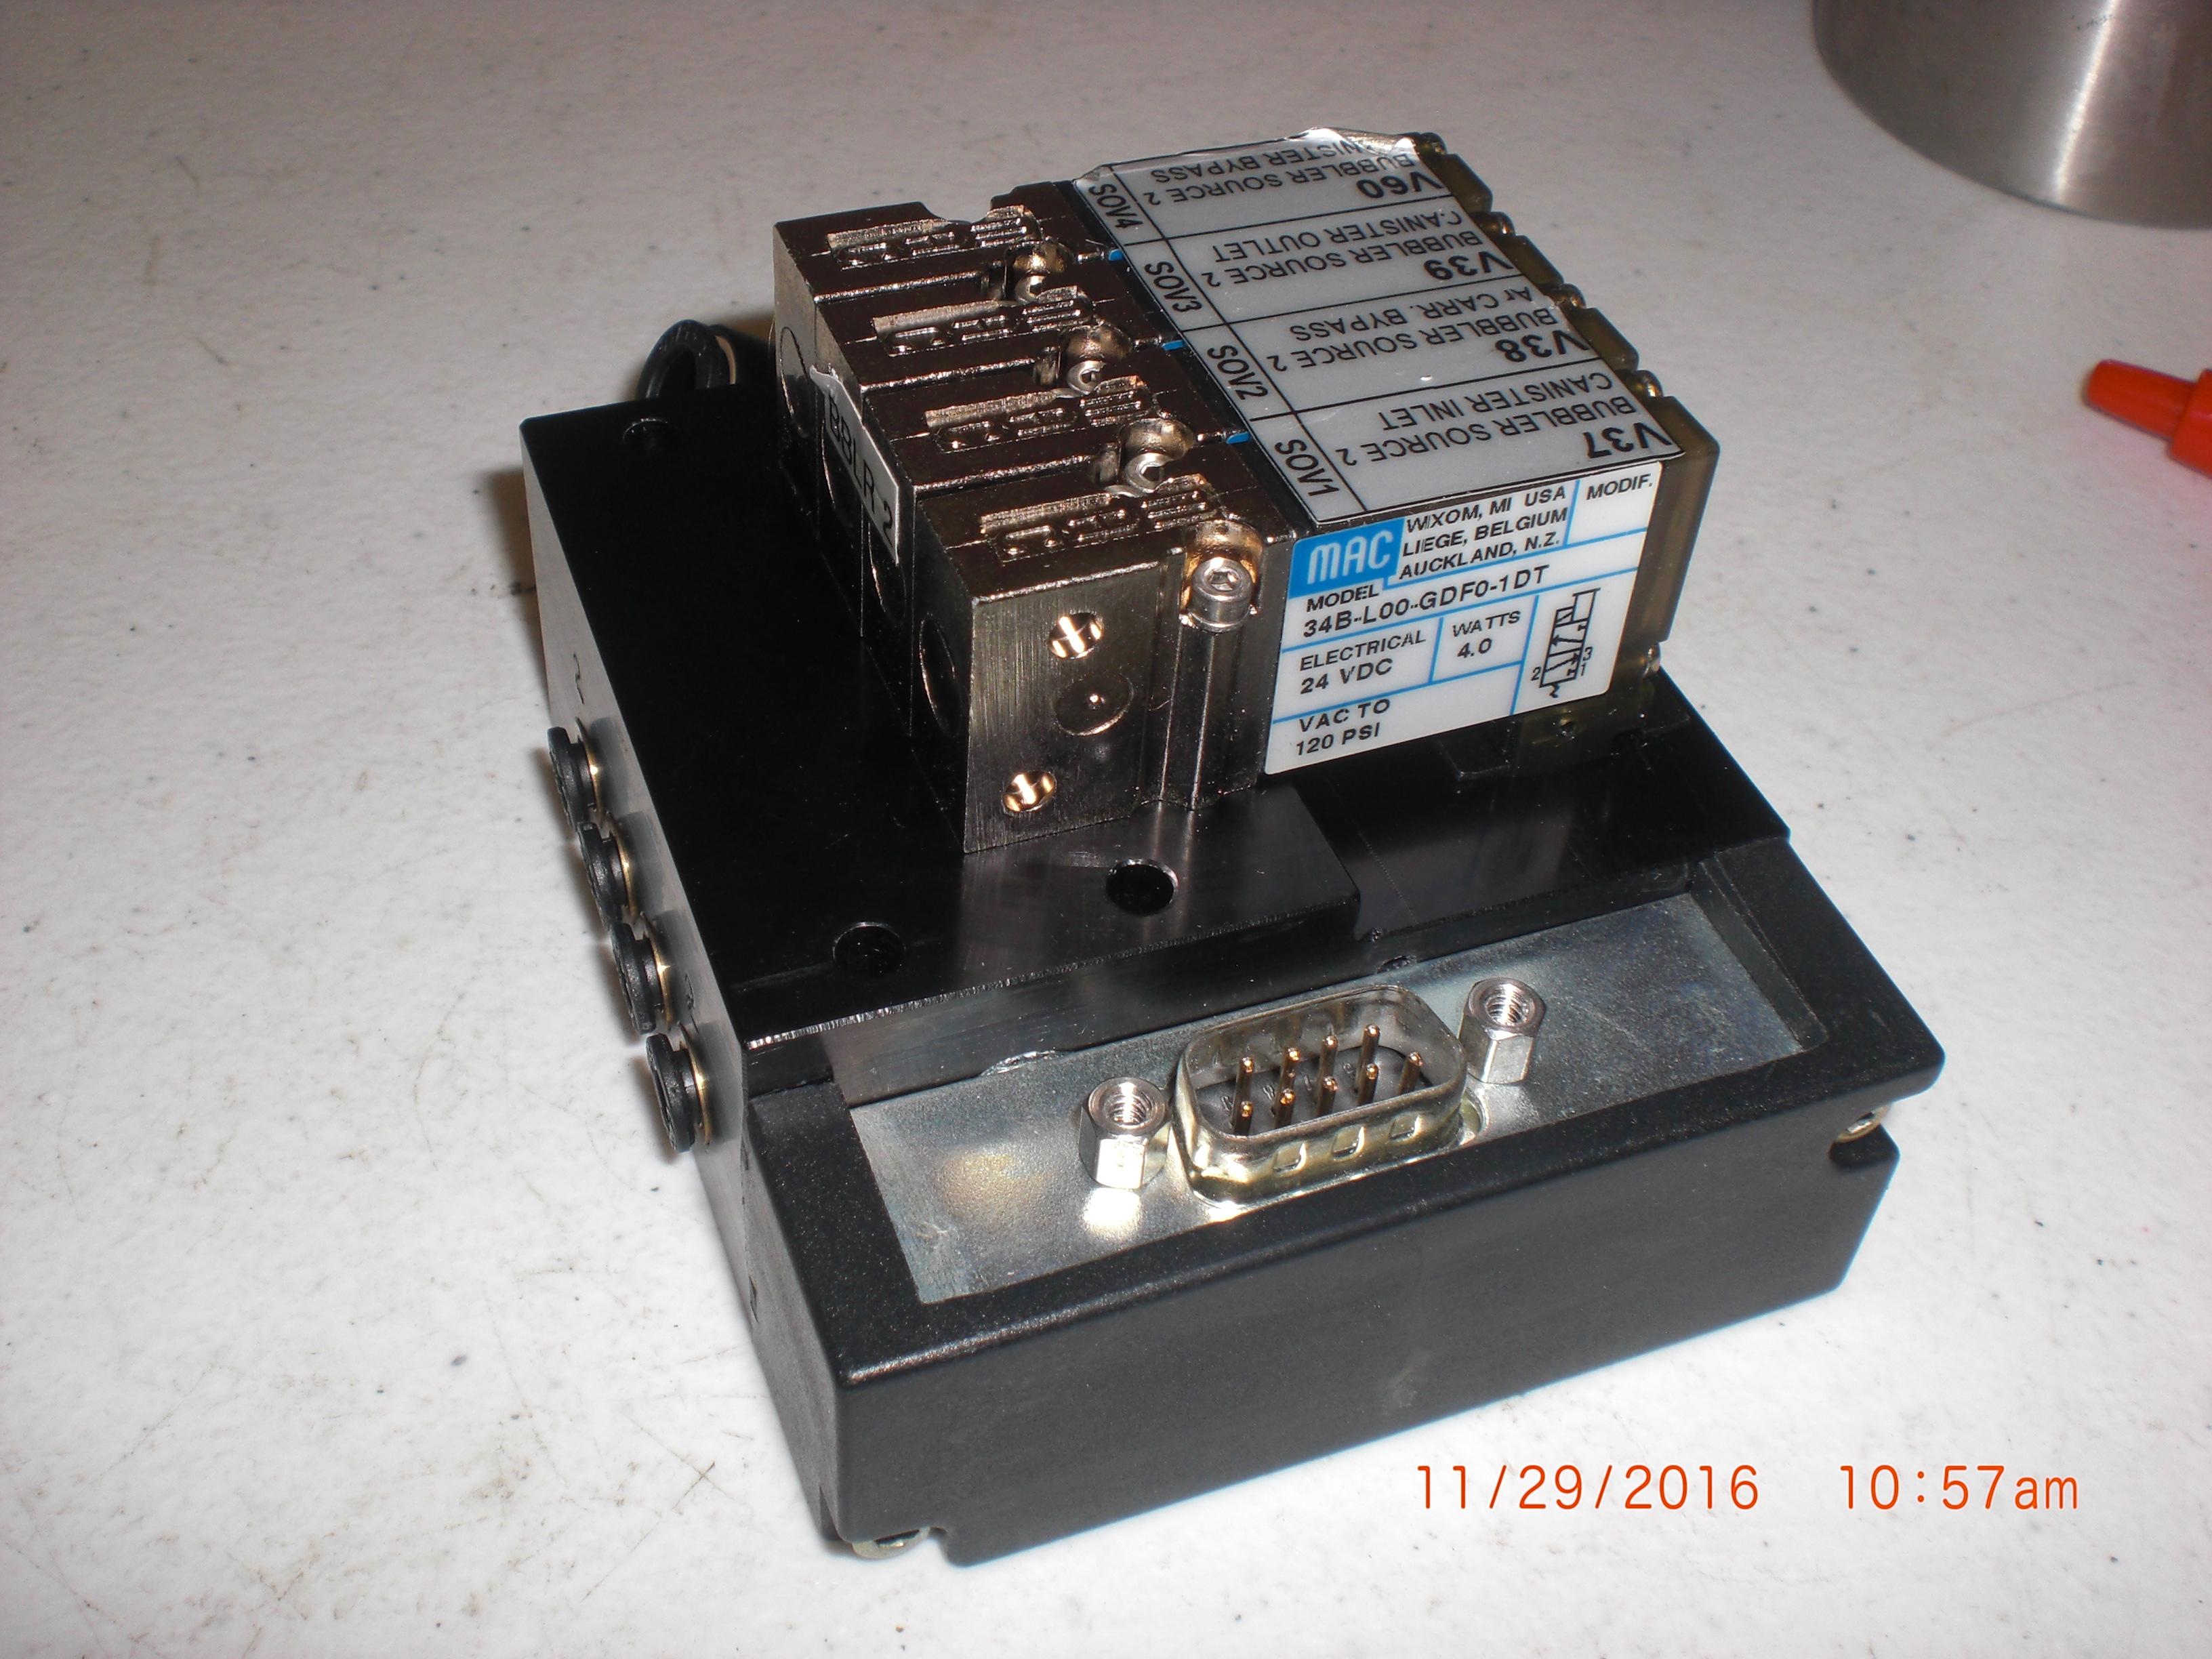 Valve MAC 34B-L00-GDF0-1DT Valve Solenoid Manifold 4 position, 24 VDC 4.0 watts 120 psi to VAC